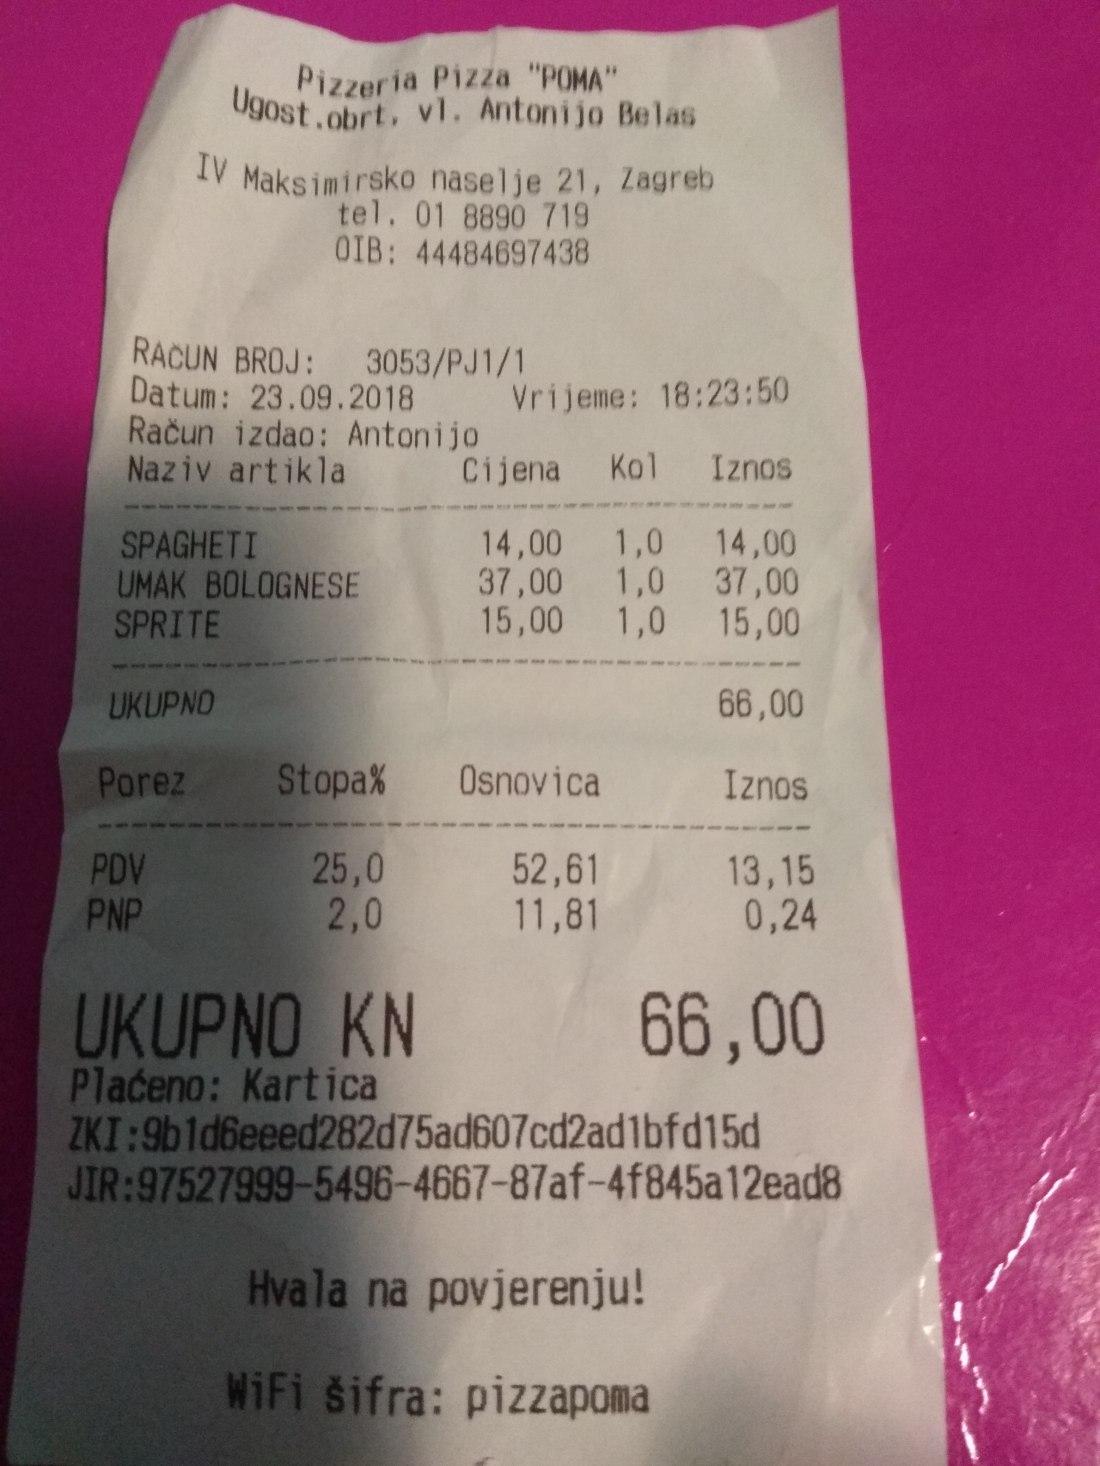 Restaurant receipt.jpg